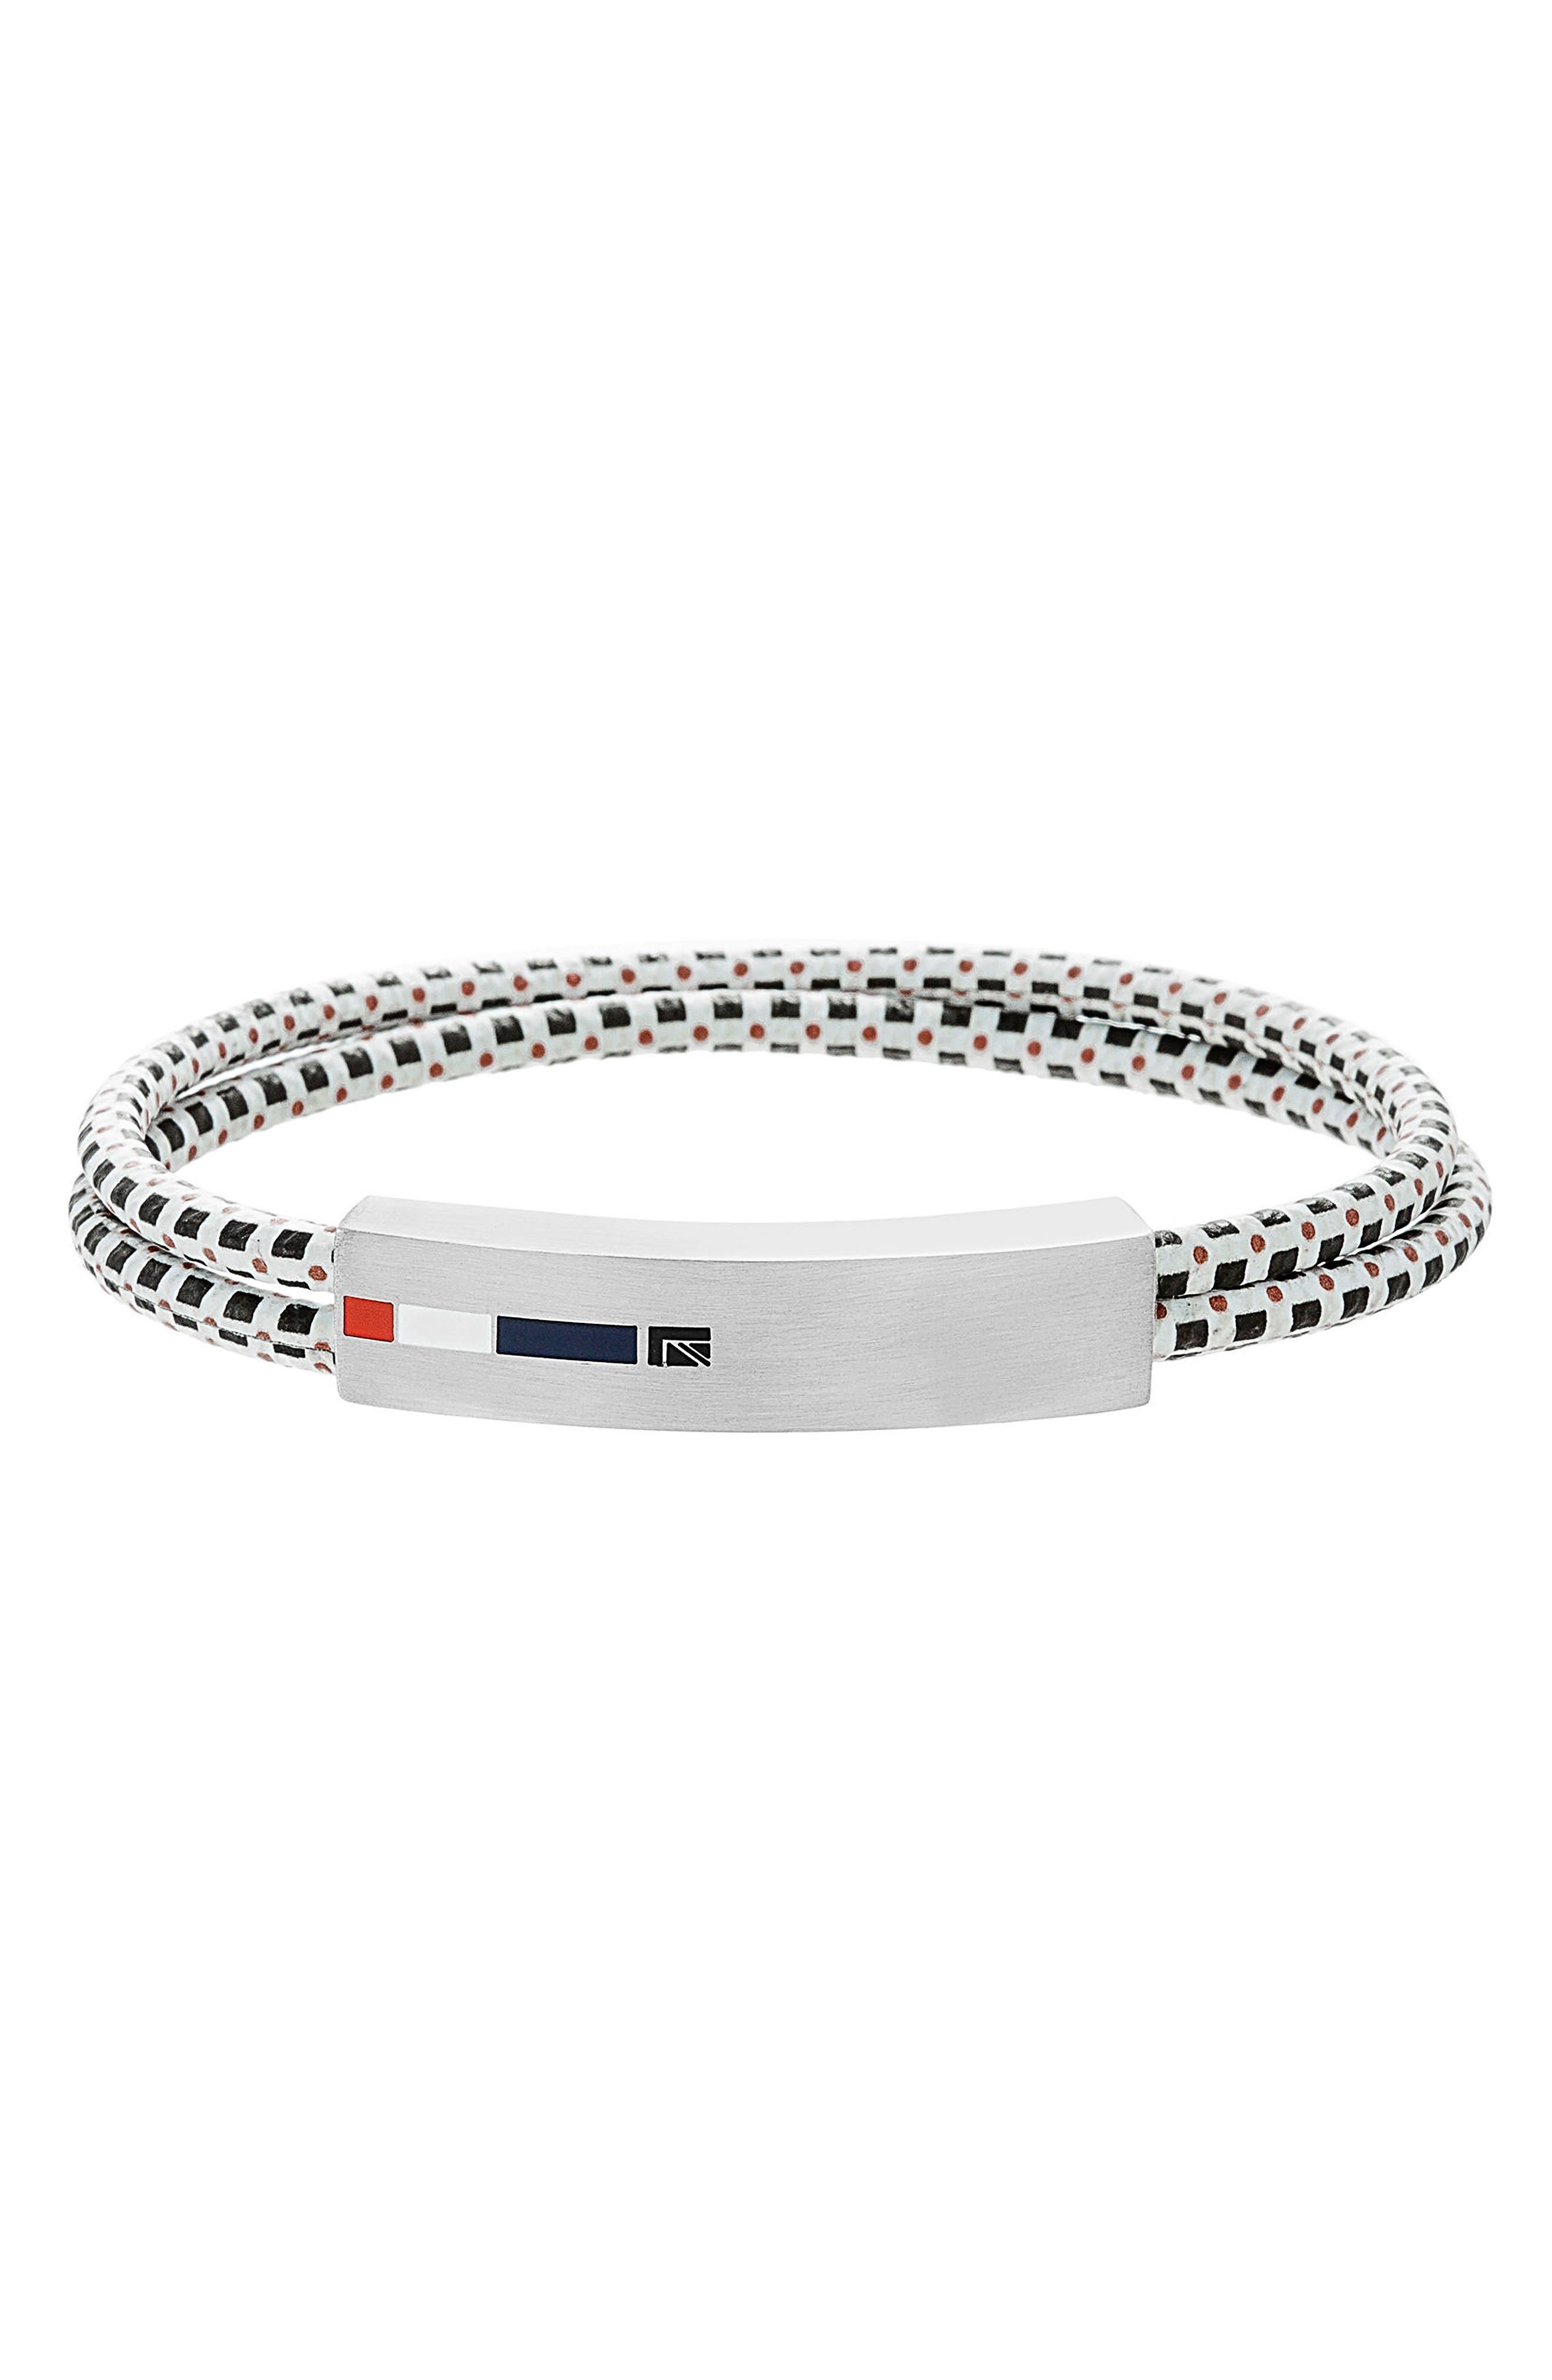 Double Cord Bracelet,                             Main thumbnail 1, color,                             Black/ Silver/ White